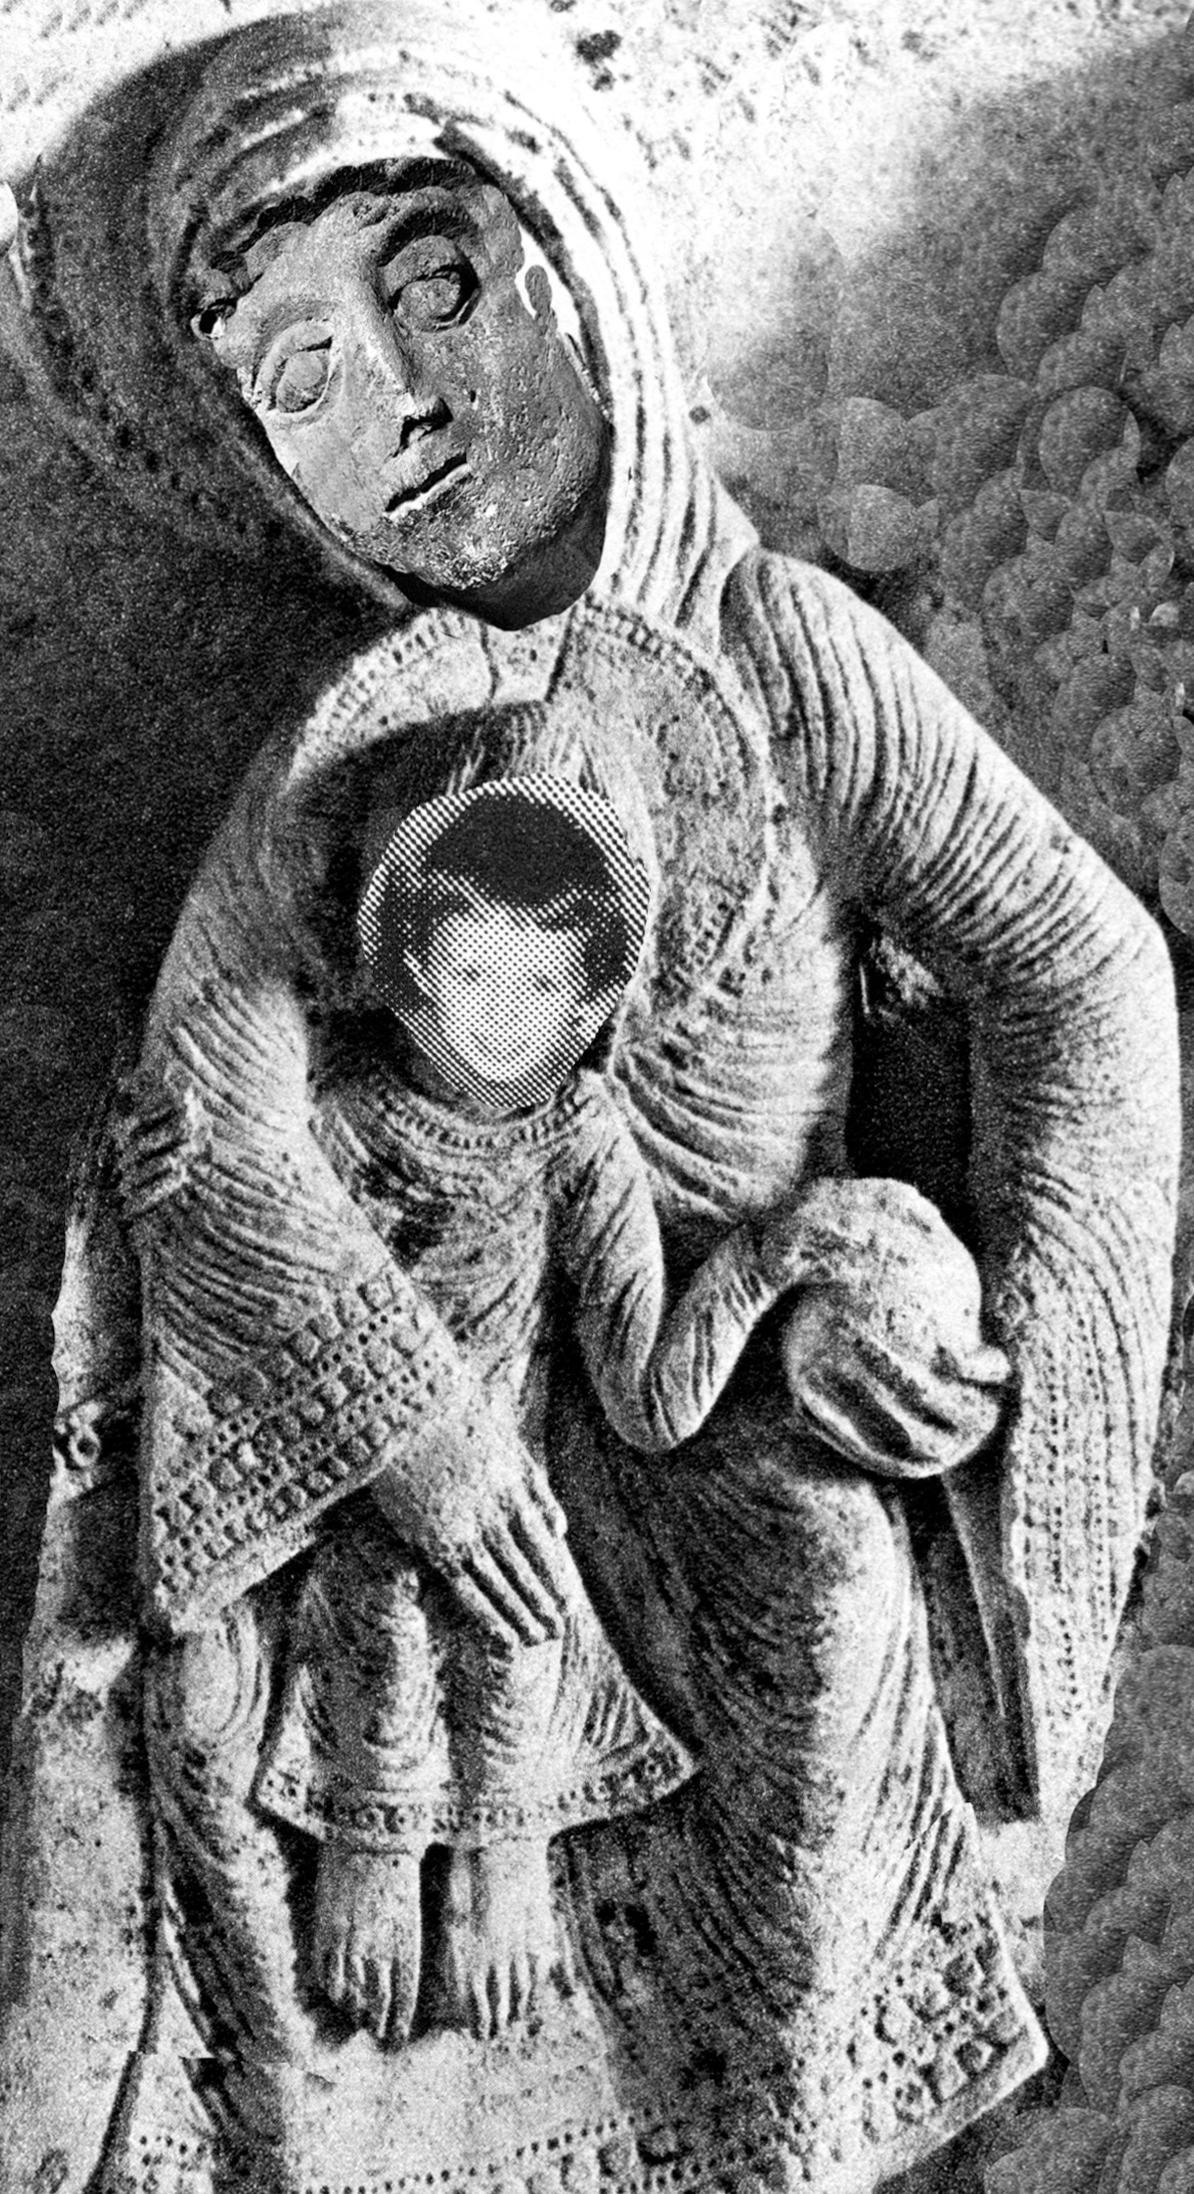 Son of Gislebertus, collage by Wouter van Riessen